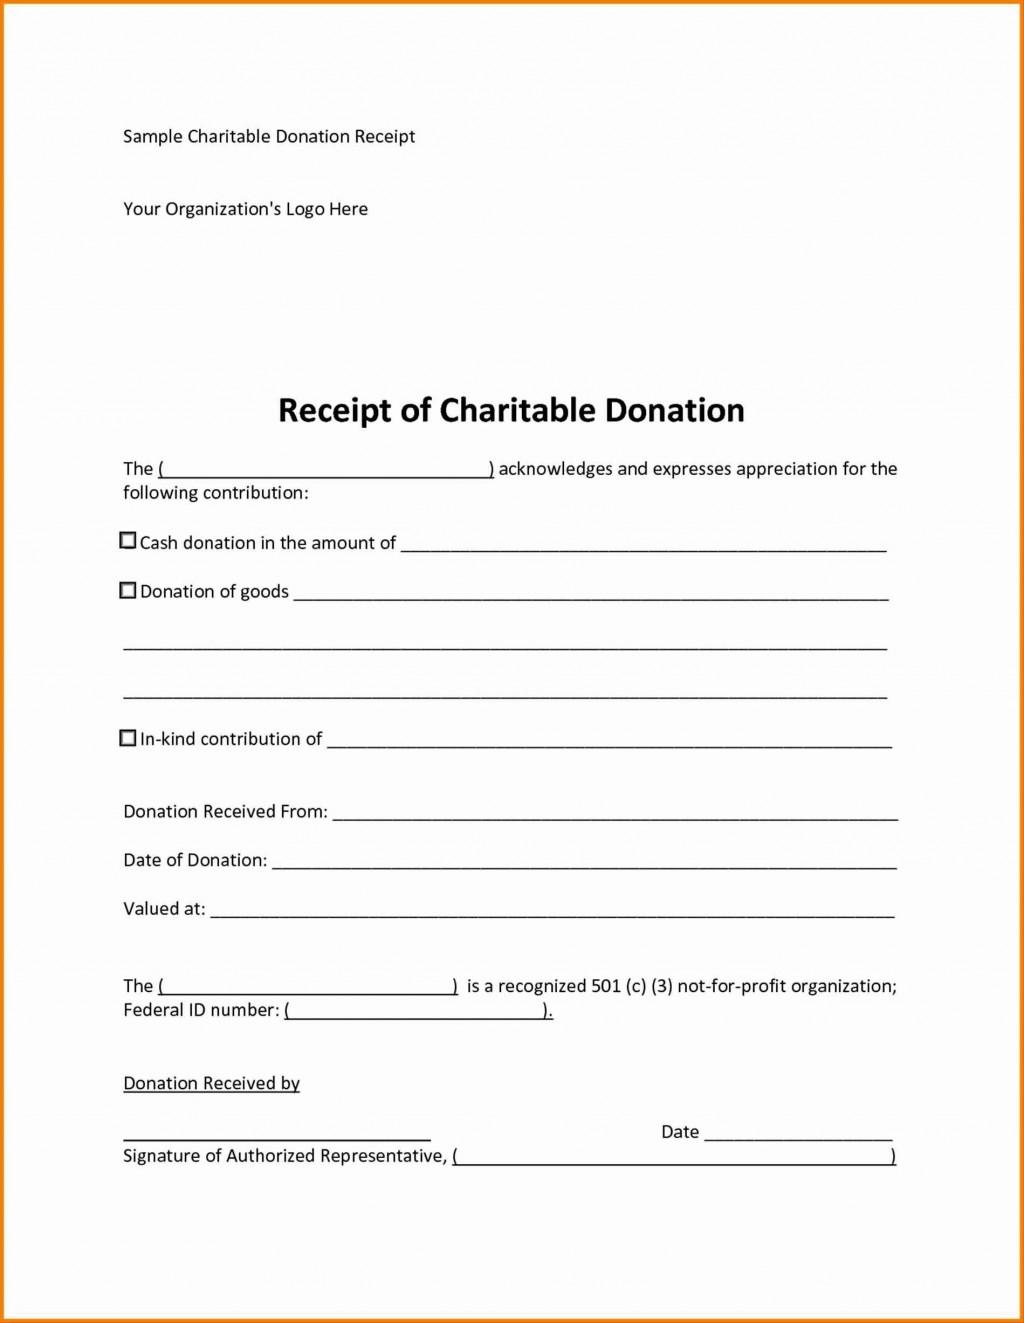 007 Magnificent Tax Donation Receipt Template Idea  Canadian Charitable Letter Church DeductionLarge